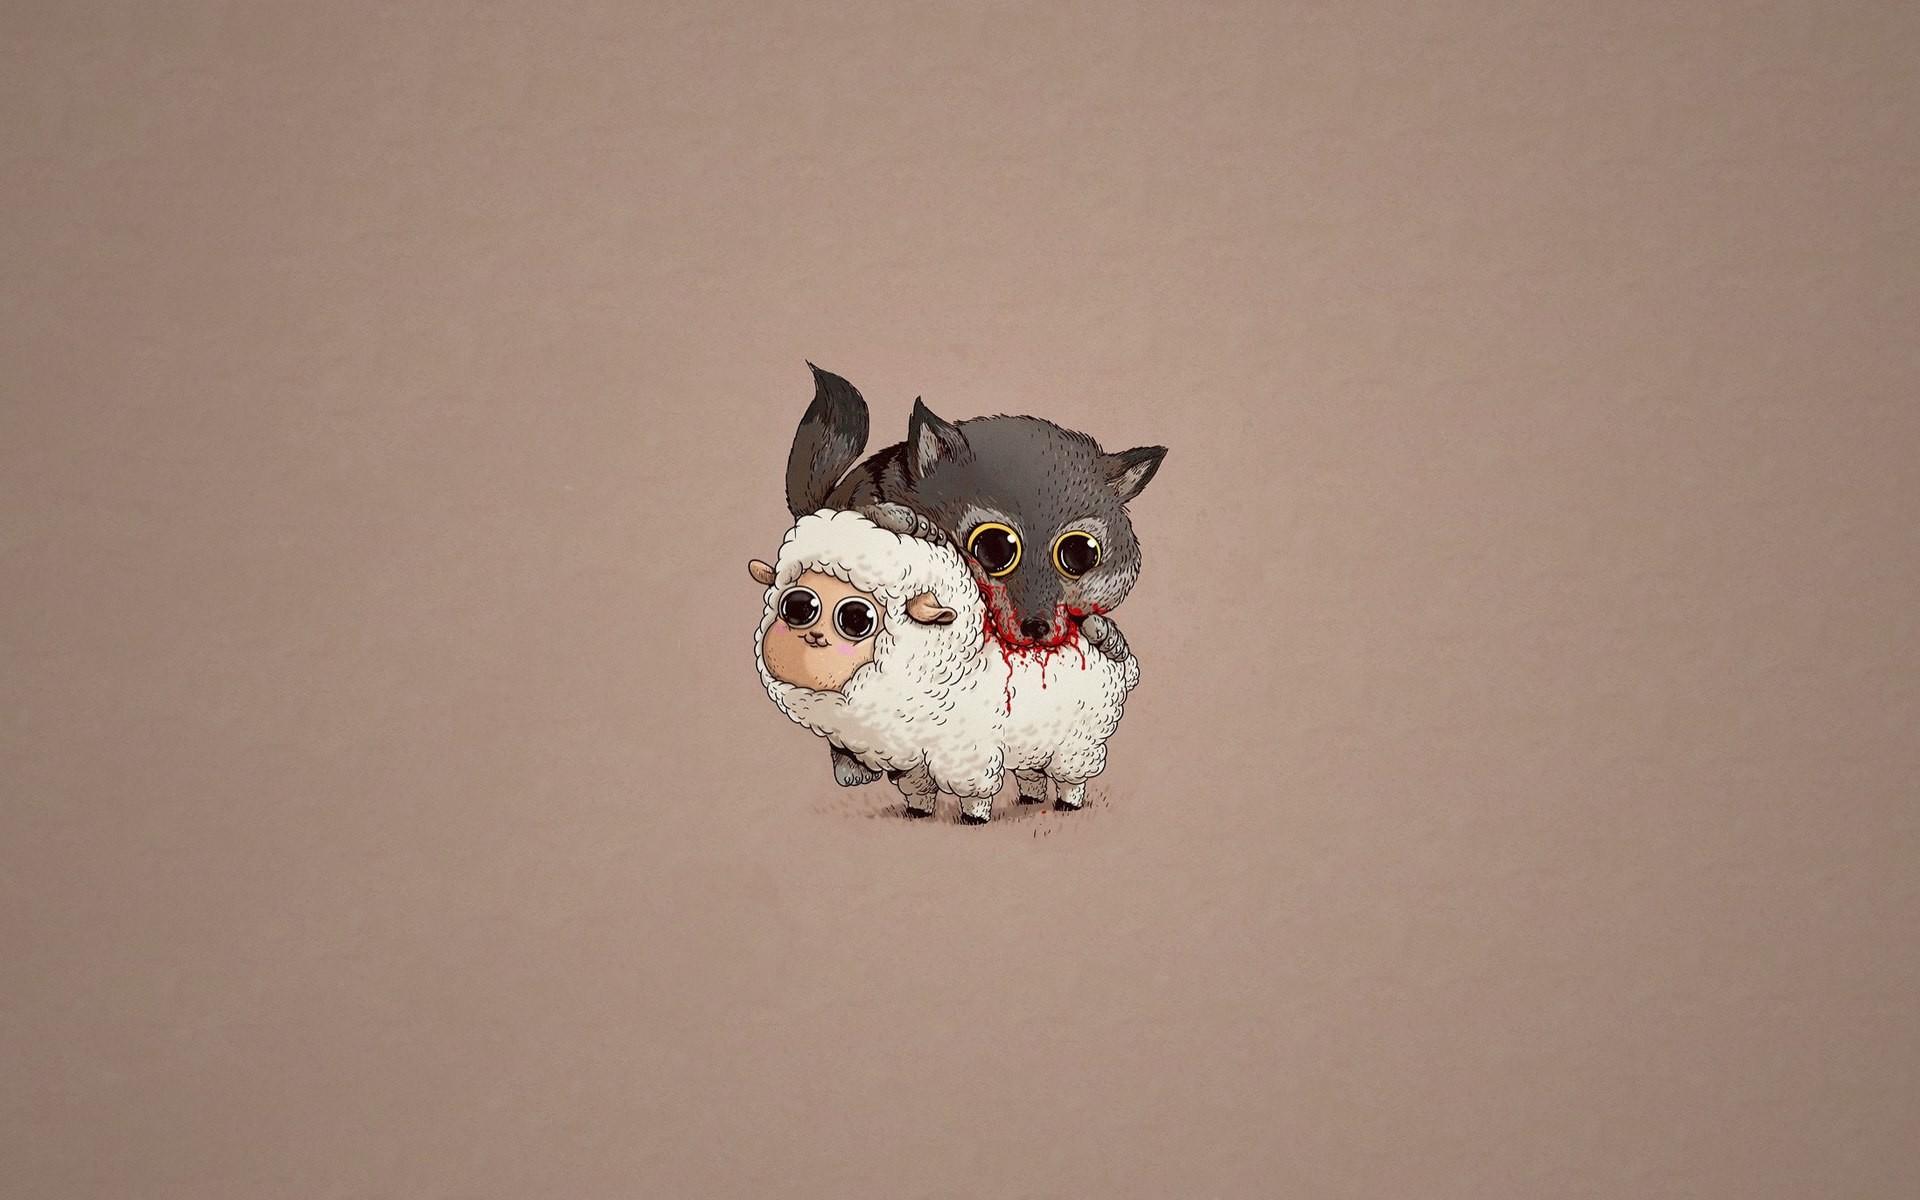 1920x1200 Px Blood Humor Minimalism Murder Sheep Wolf